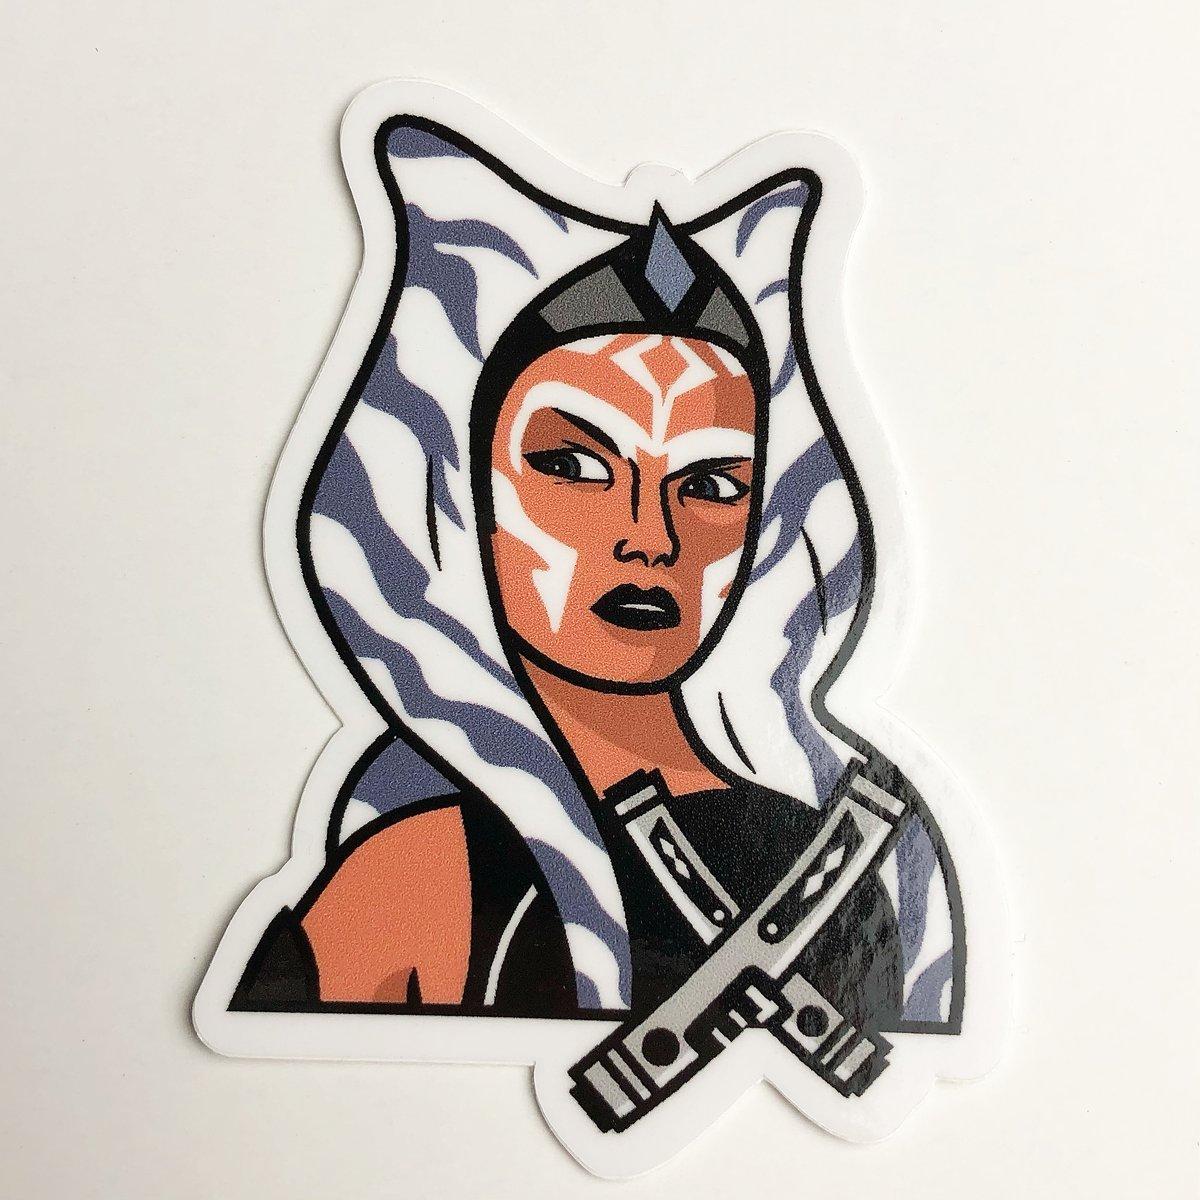 Image of 'Rebels Ahsoka' Sticker